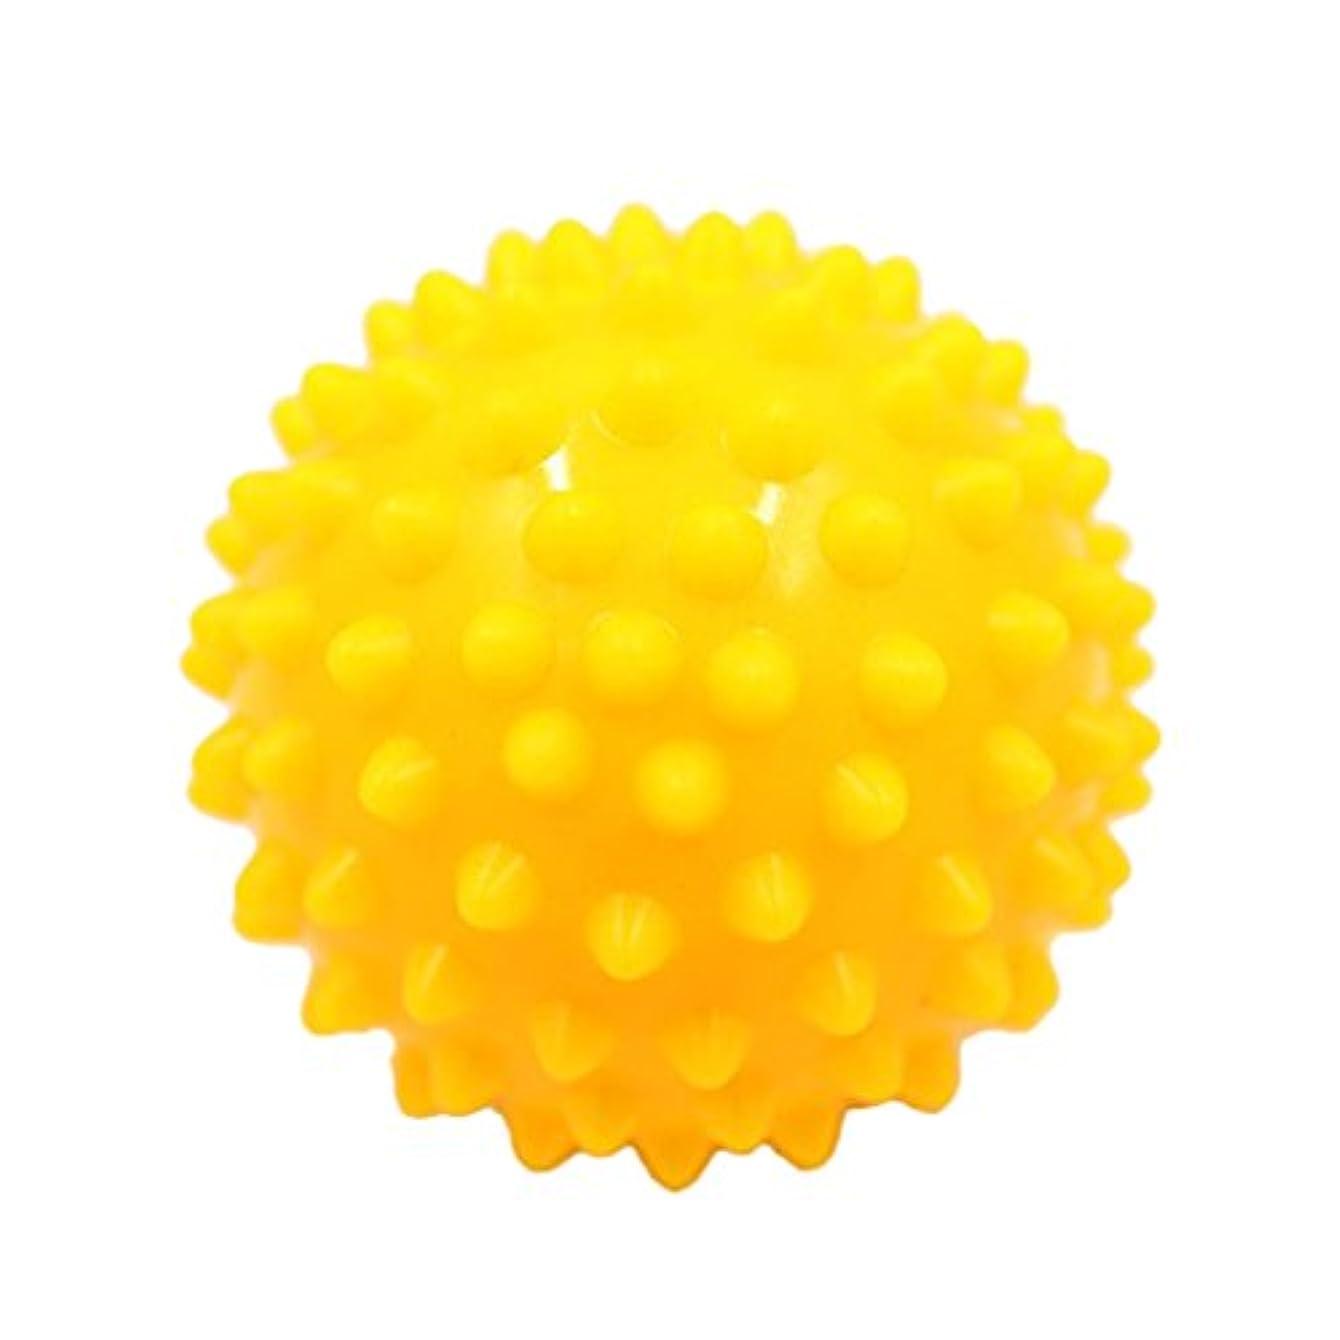 Kesoto マッサージボール マッサージ器 ボディ パームレリーフ スパイク マッサージ 刺激ボール 3色選べ - 黄